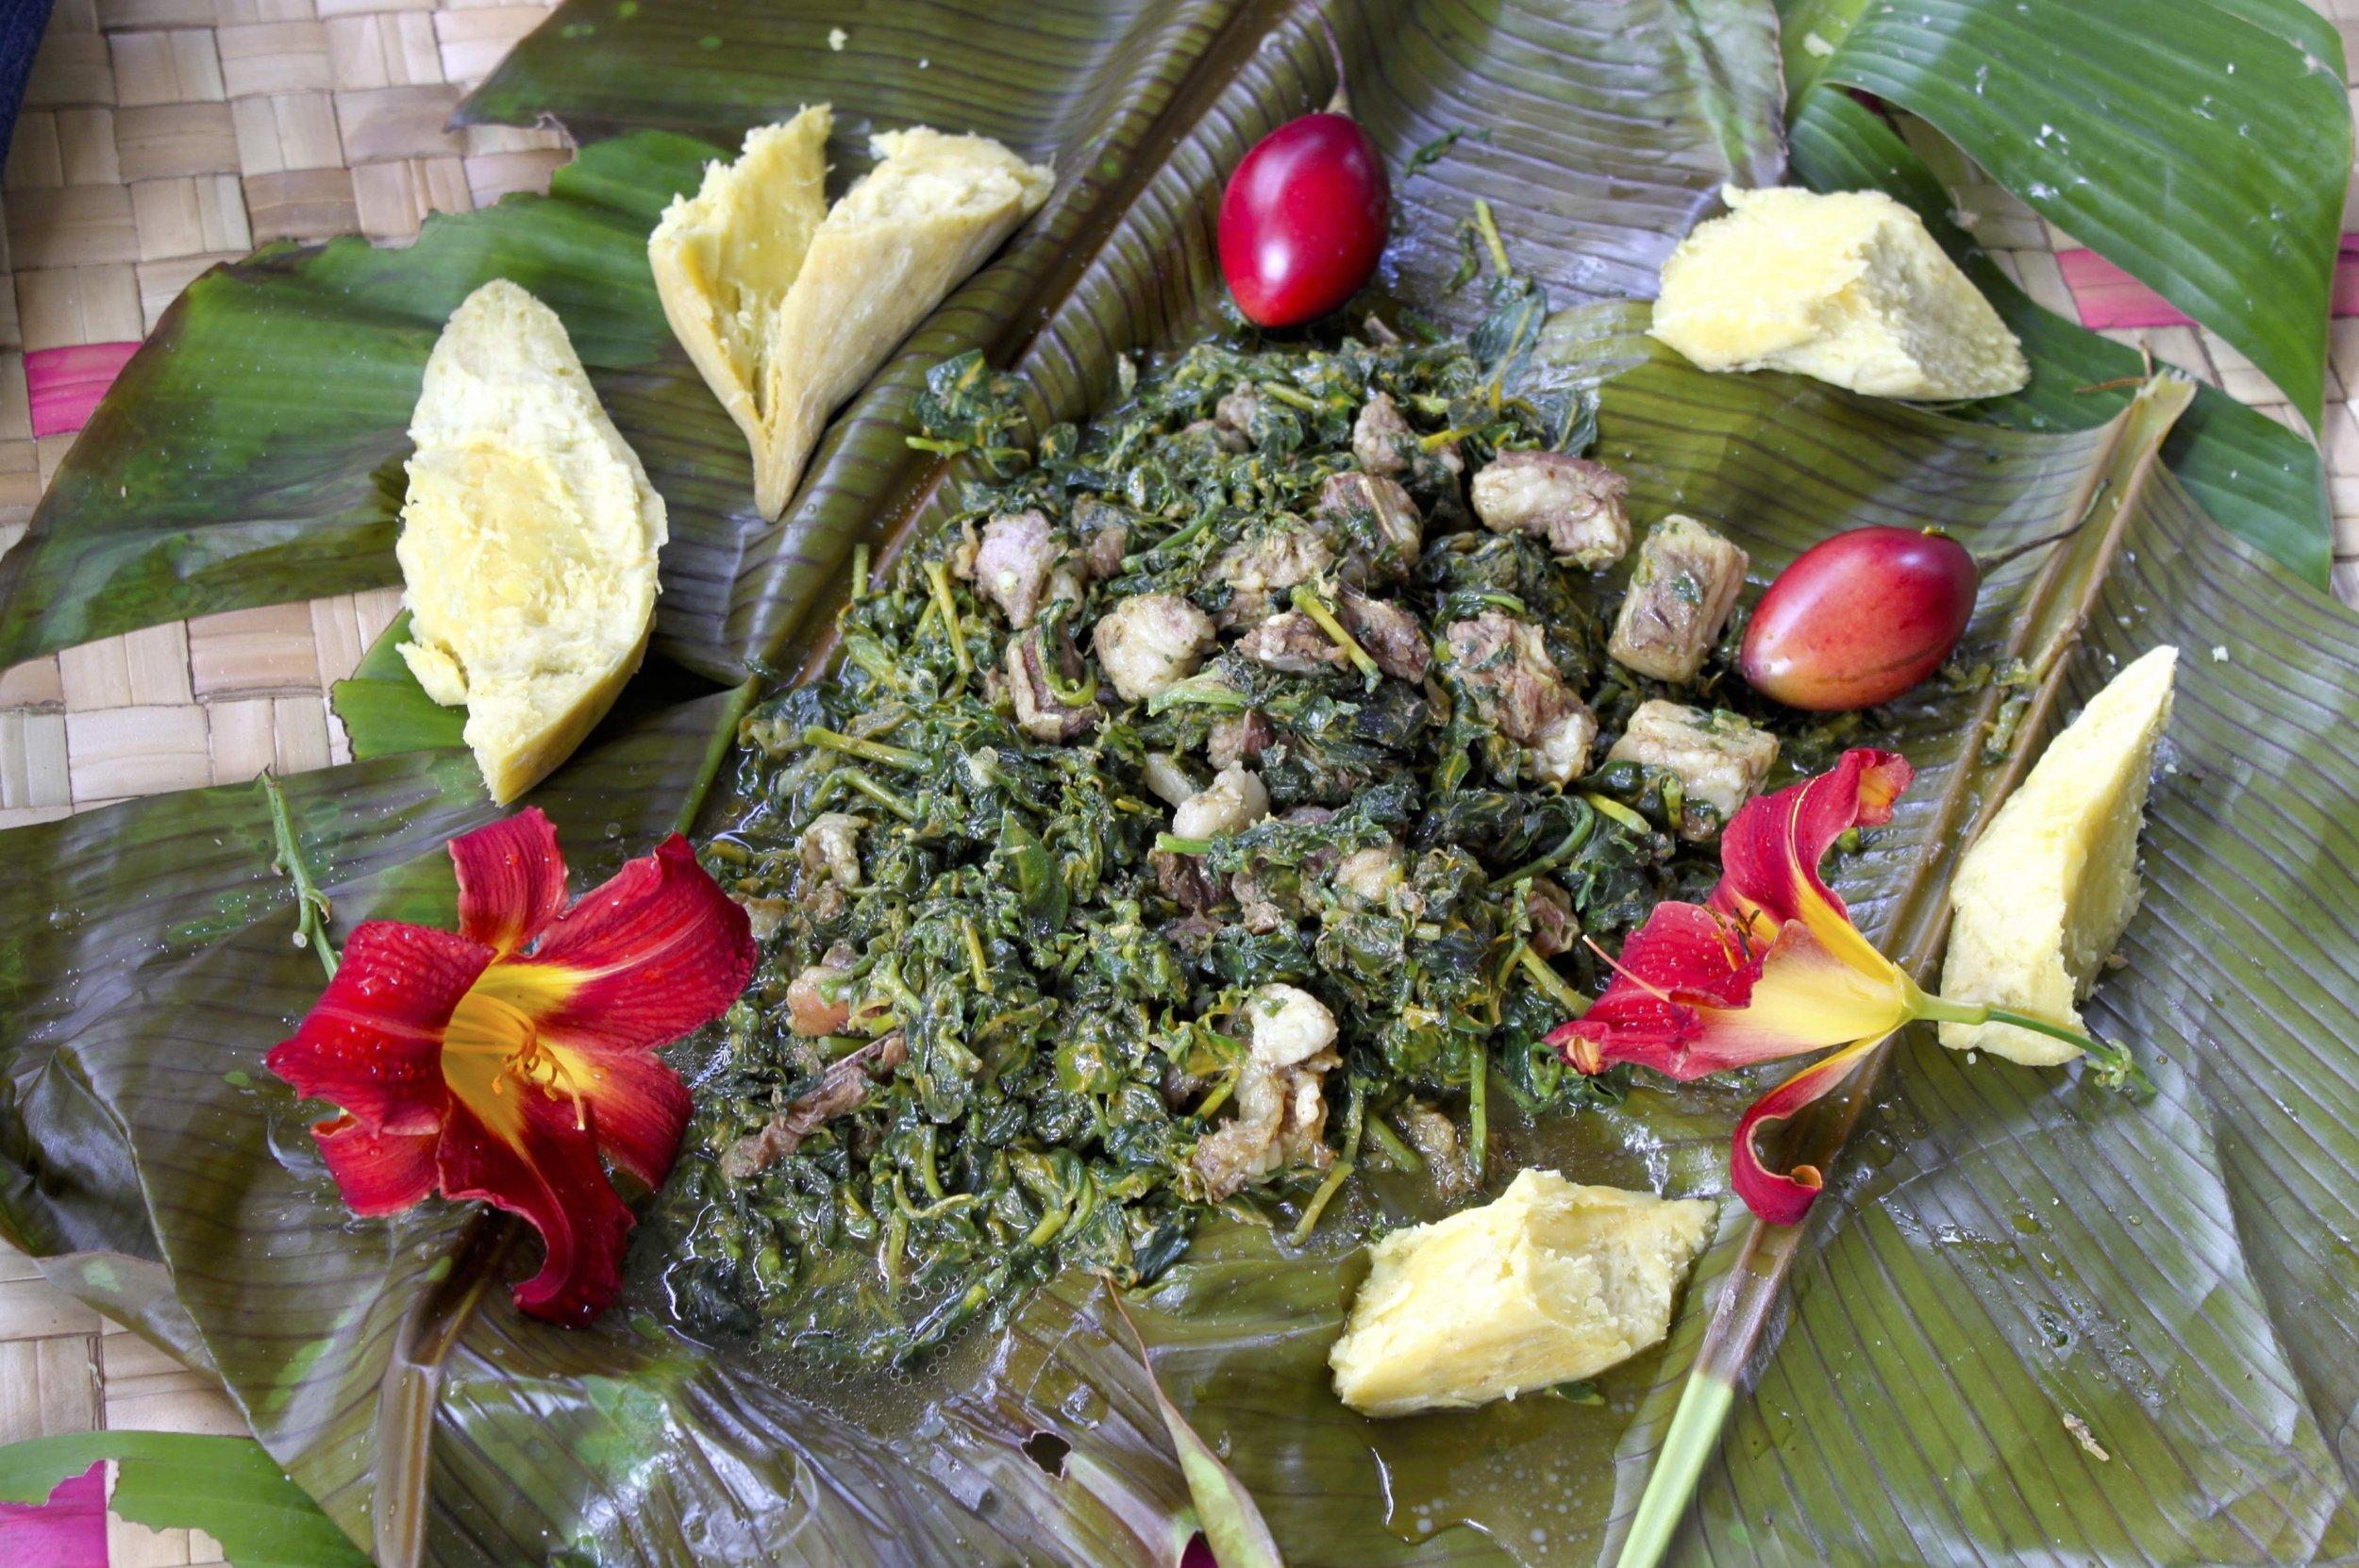 Bamboo cooking dish with lamb and kembempa fern greens from Tanna island, Vanuatu